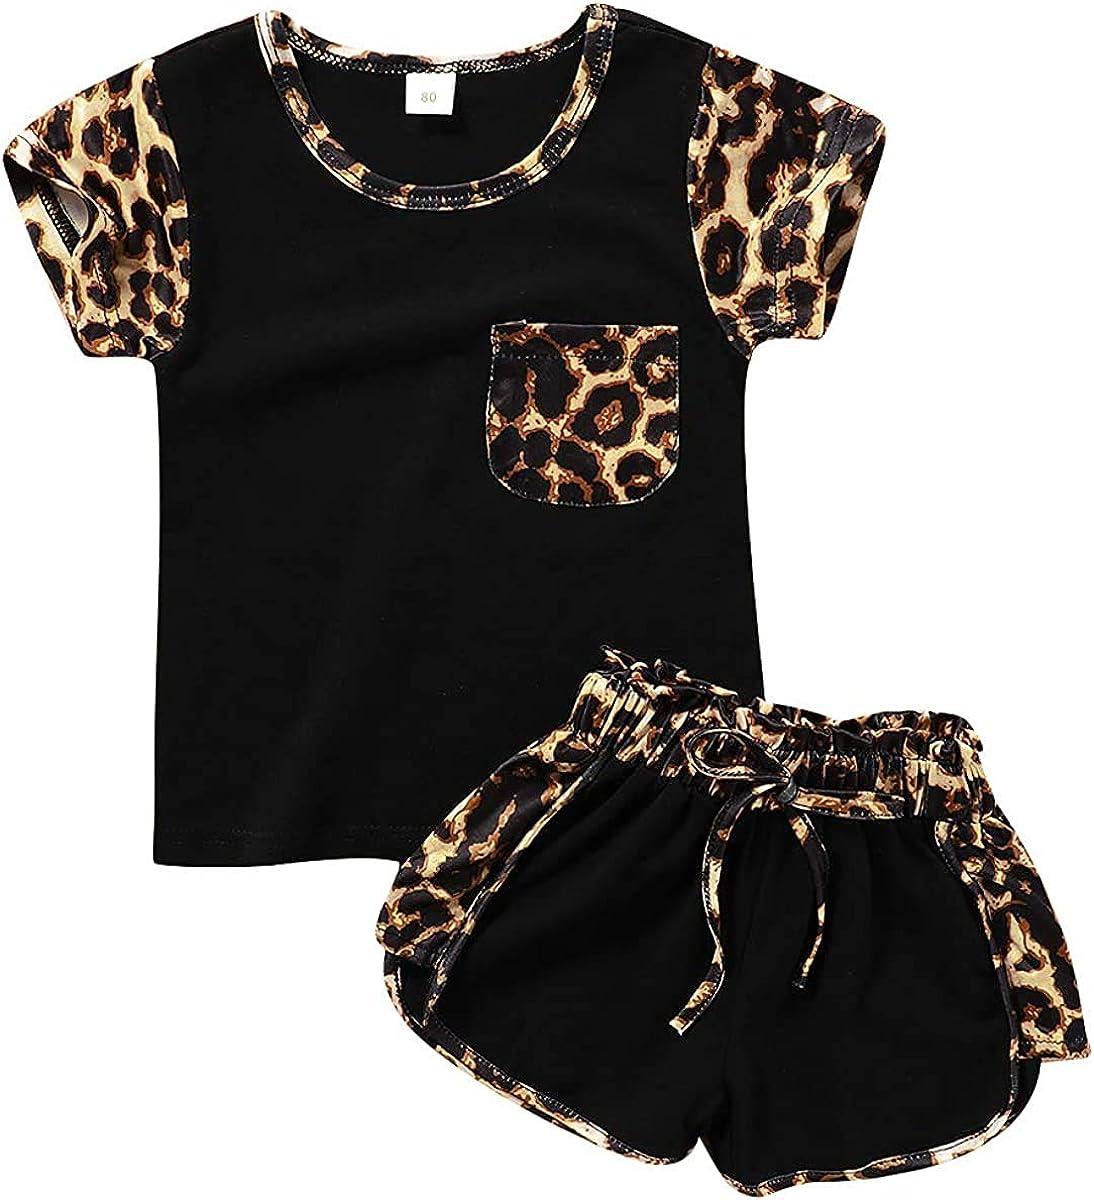 Leopard Shorts Pants Summer Outfits Set Toddler Kids Baby Girl Clothes Short Sleeve Pocket Top T Shirt